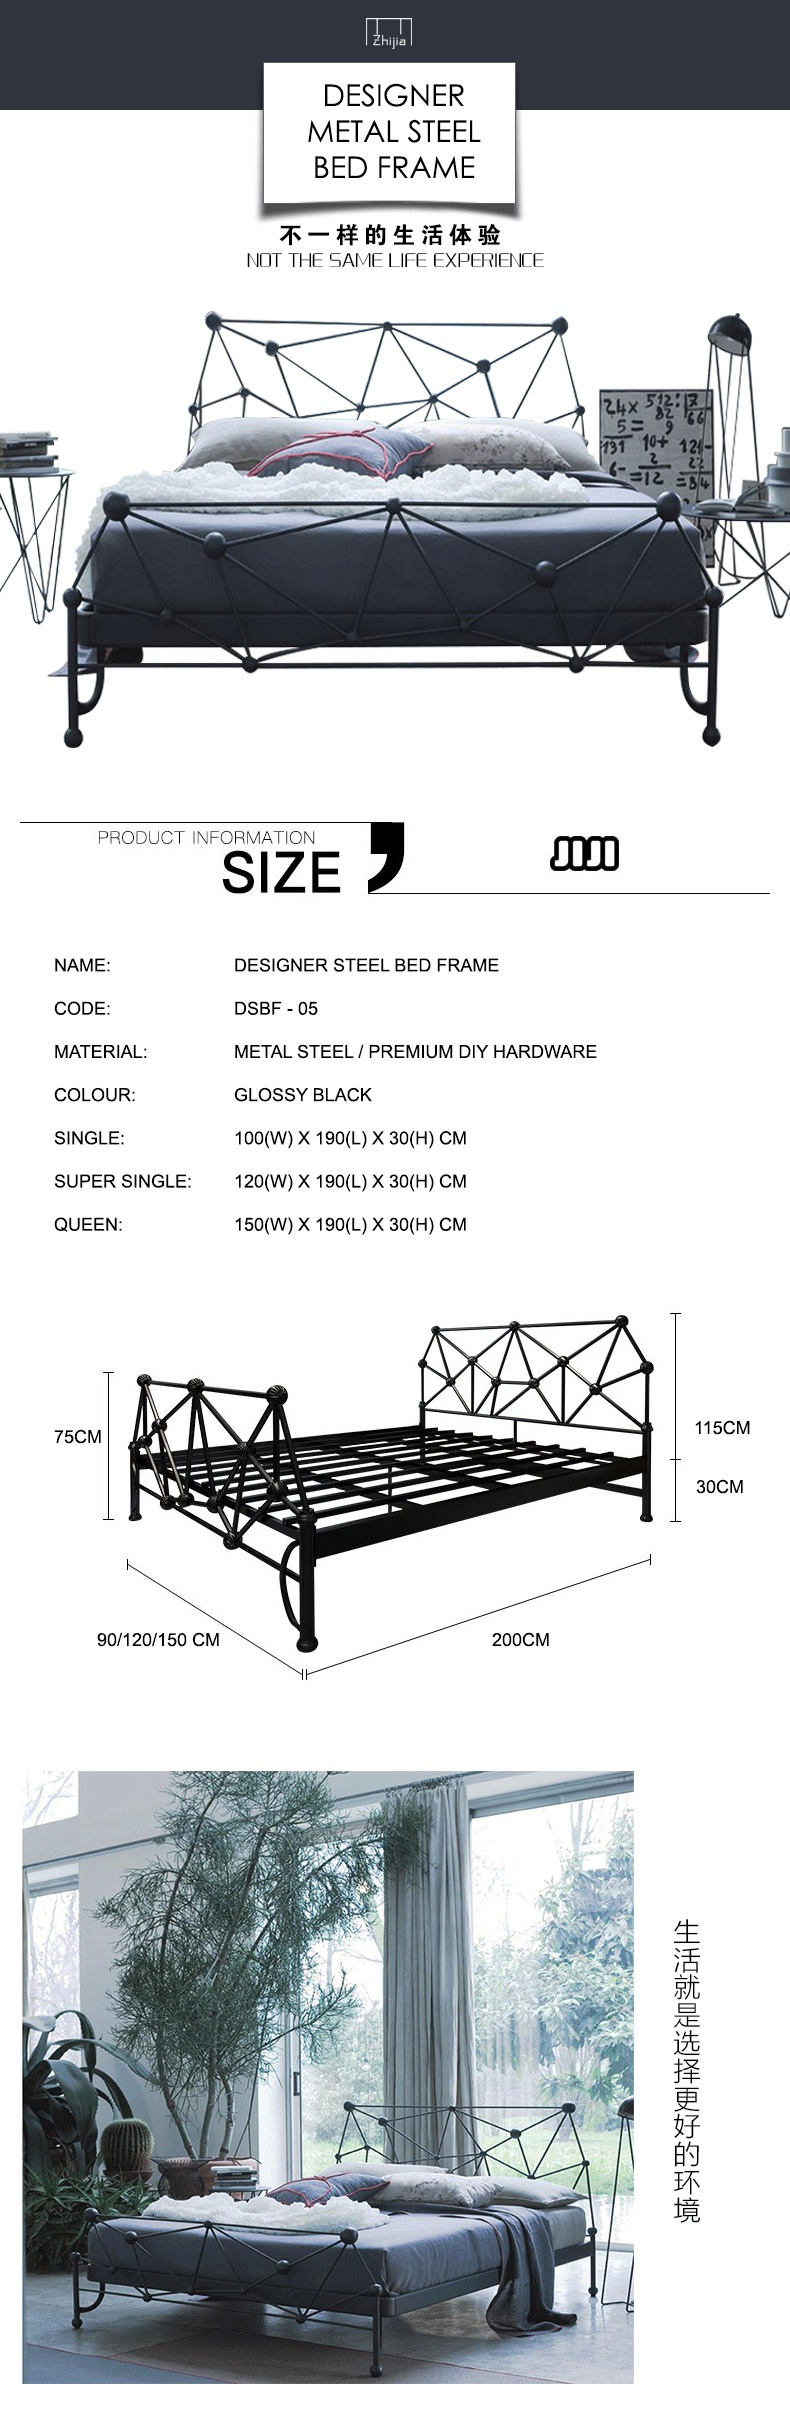 Metal Steel Bed Frame (DSBF-05)